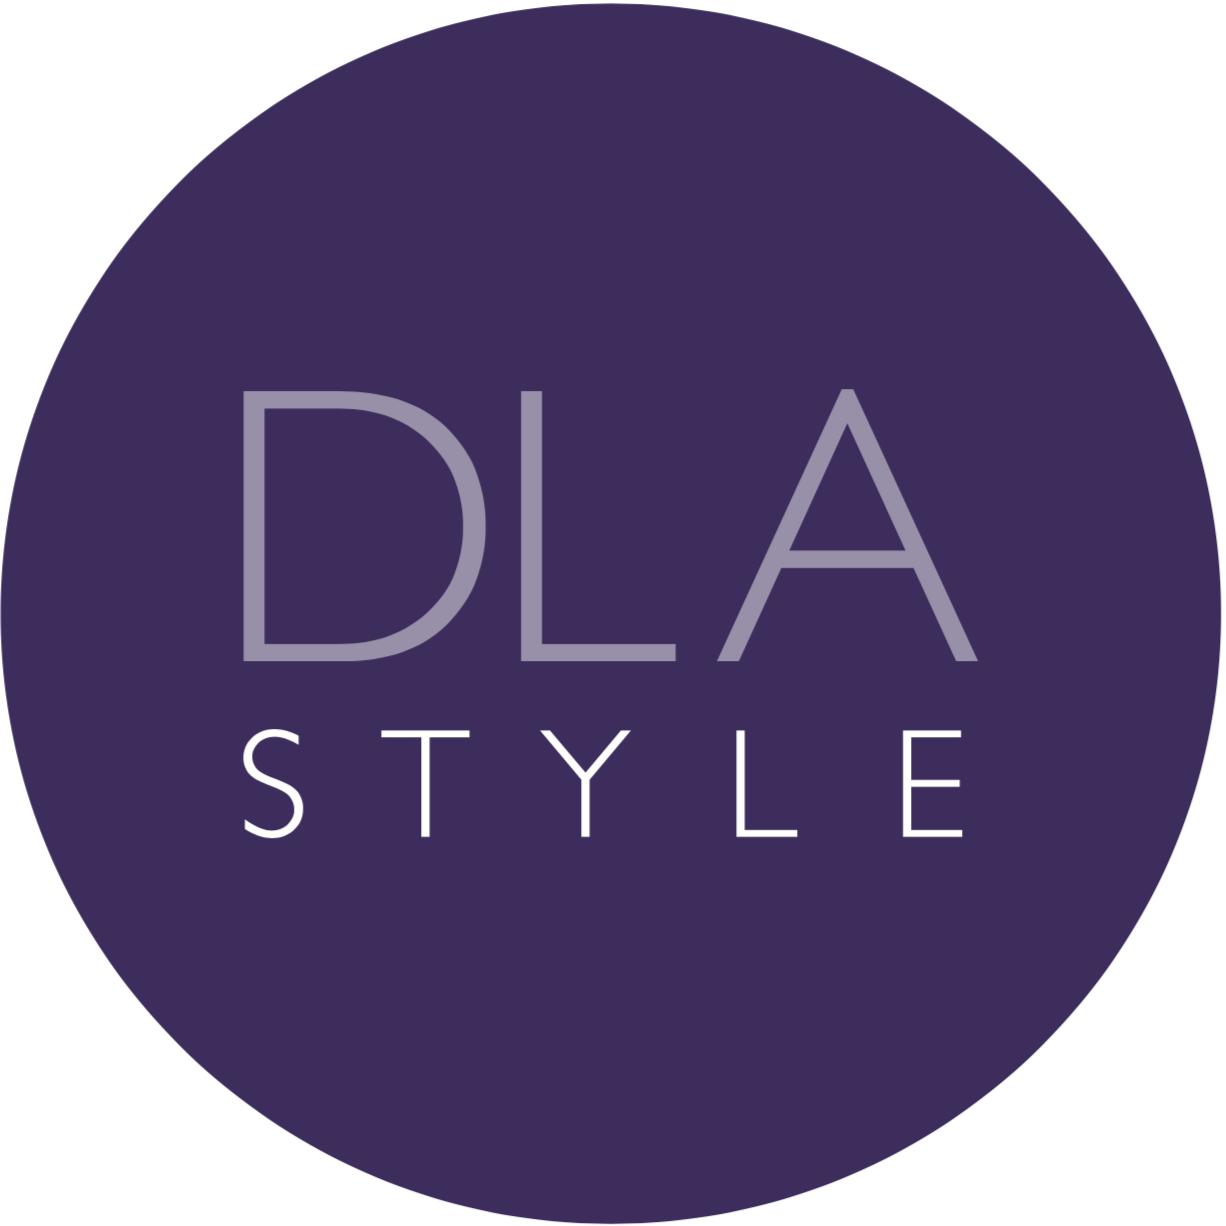 DLA Style